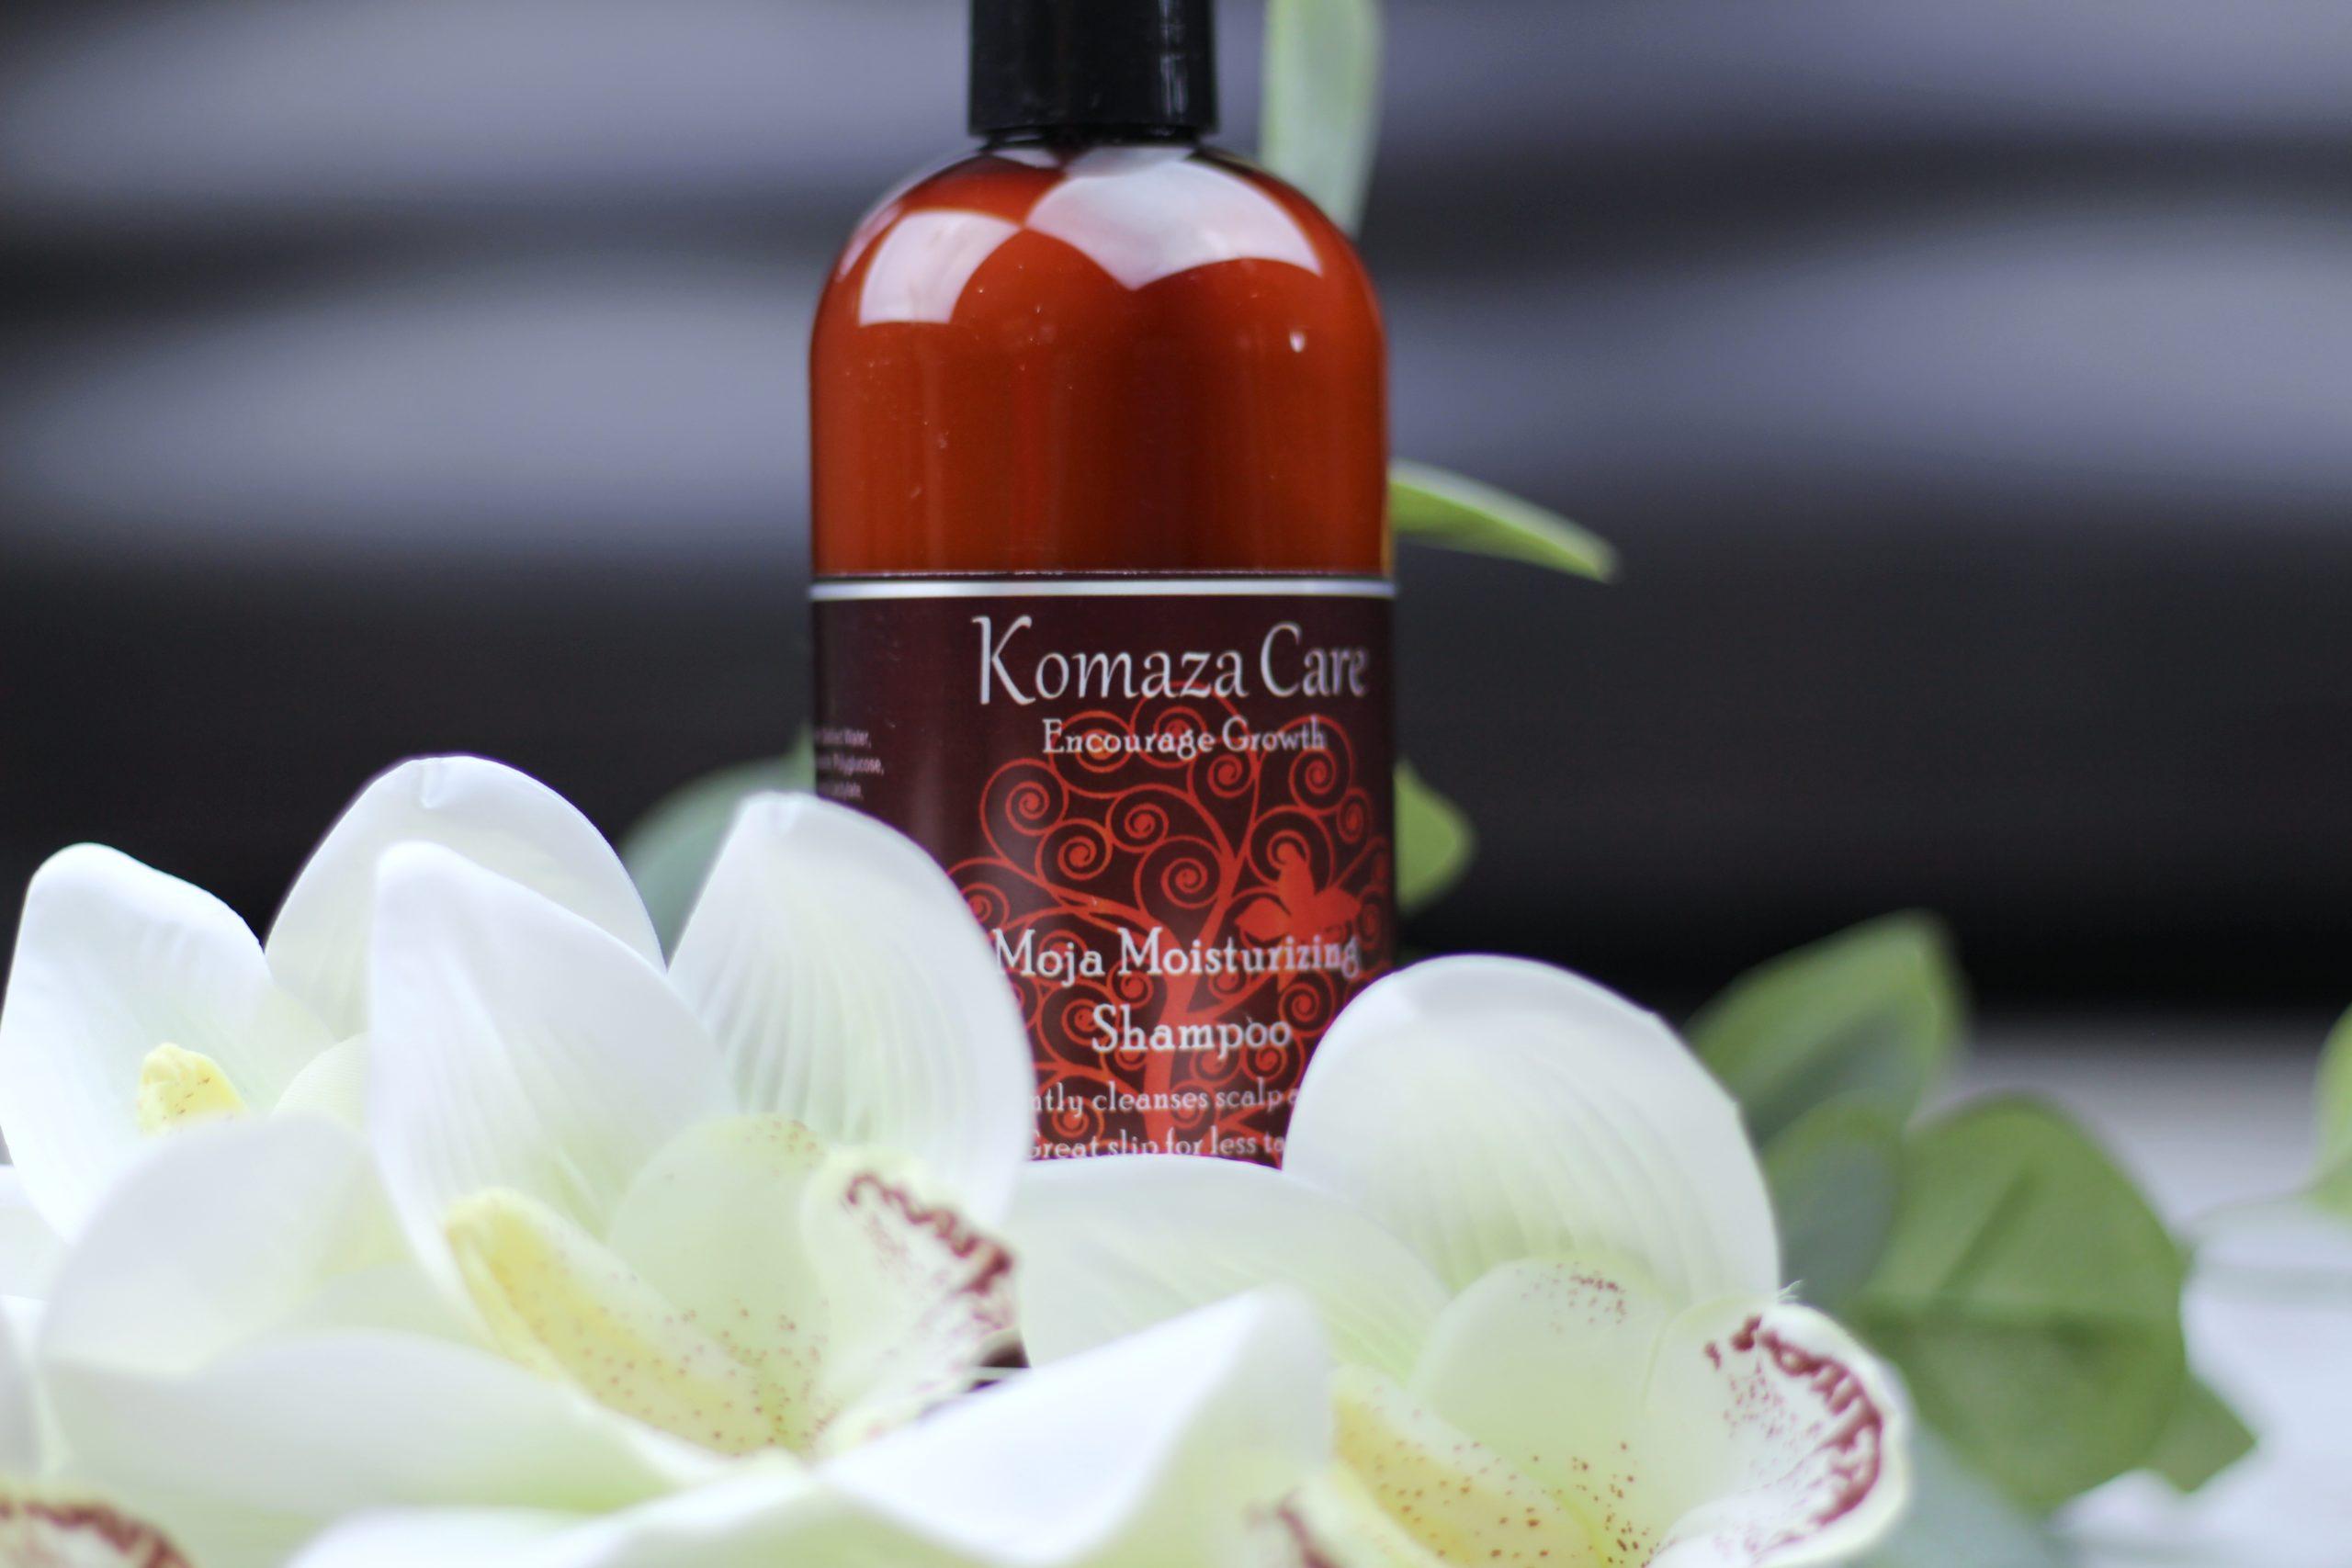 Komaza Hair Care Moja Moisturizing Shampoo